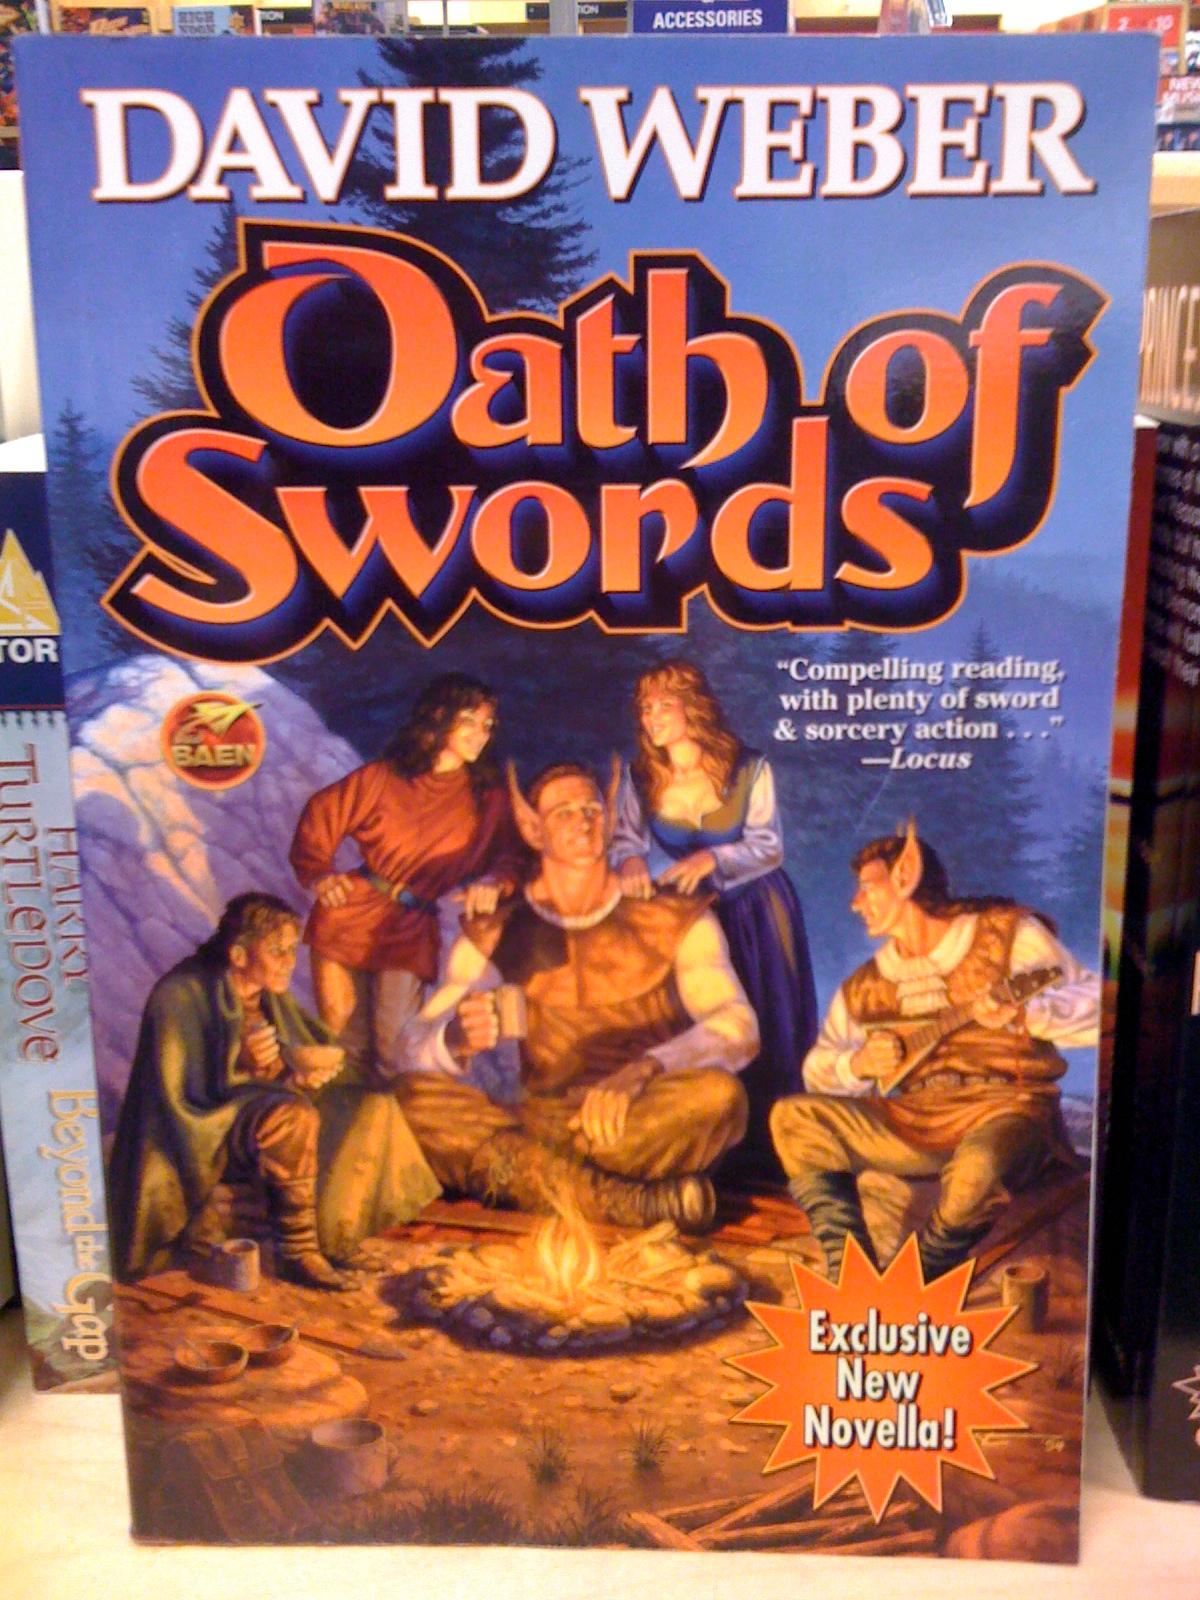 oath of swords - afterdark